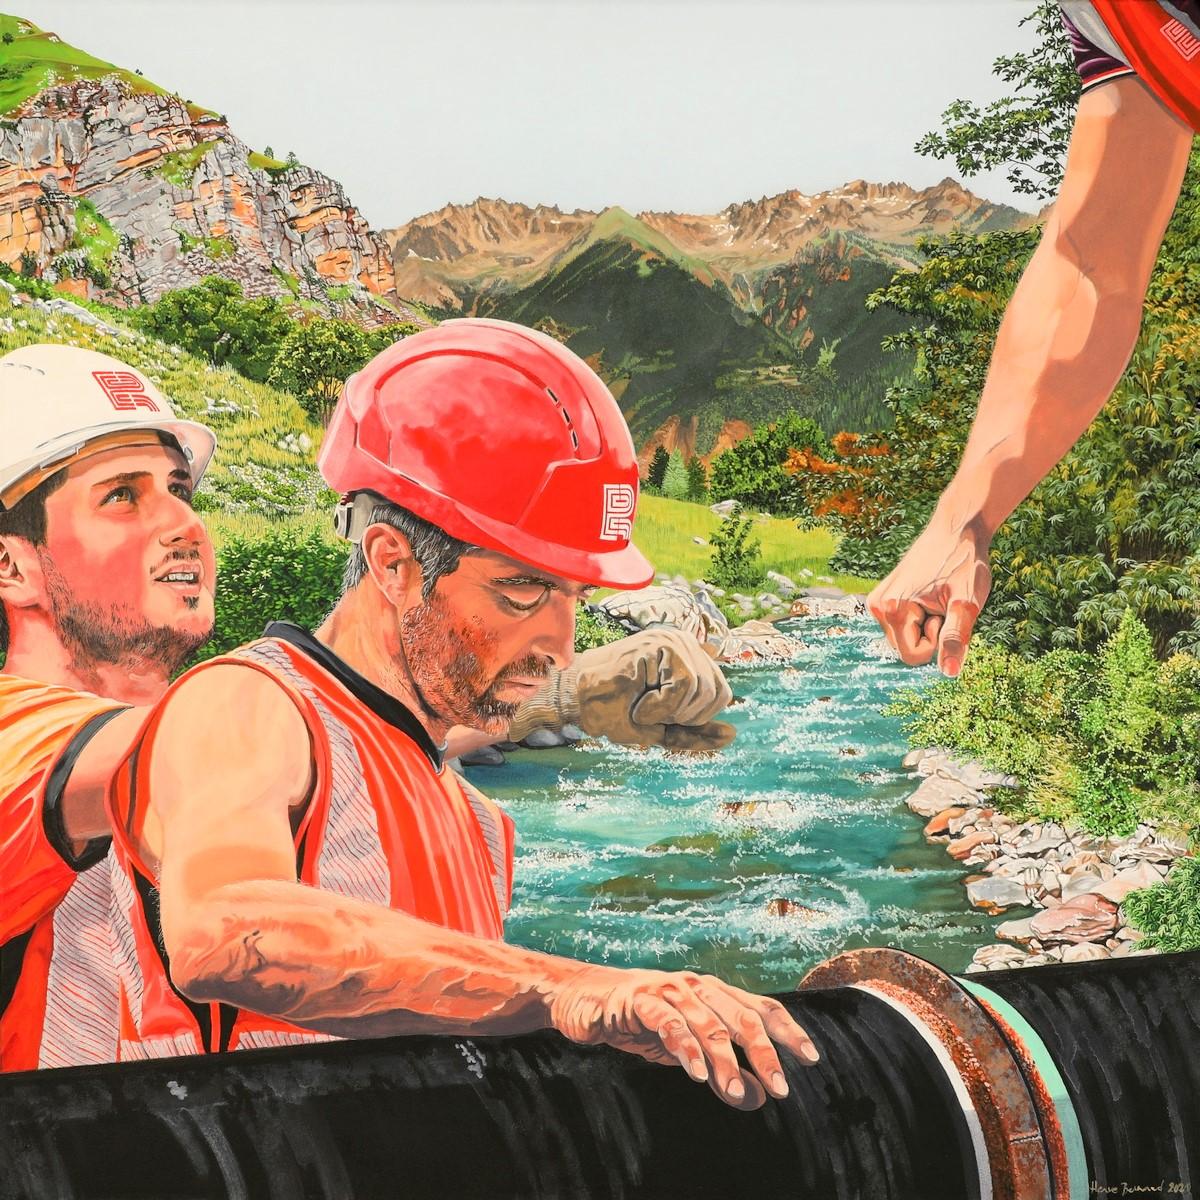 Peinture hyperréalisme Hervé Bernard : ITS THE MOST IMPORTANT